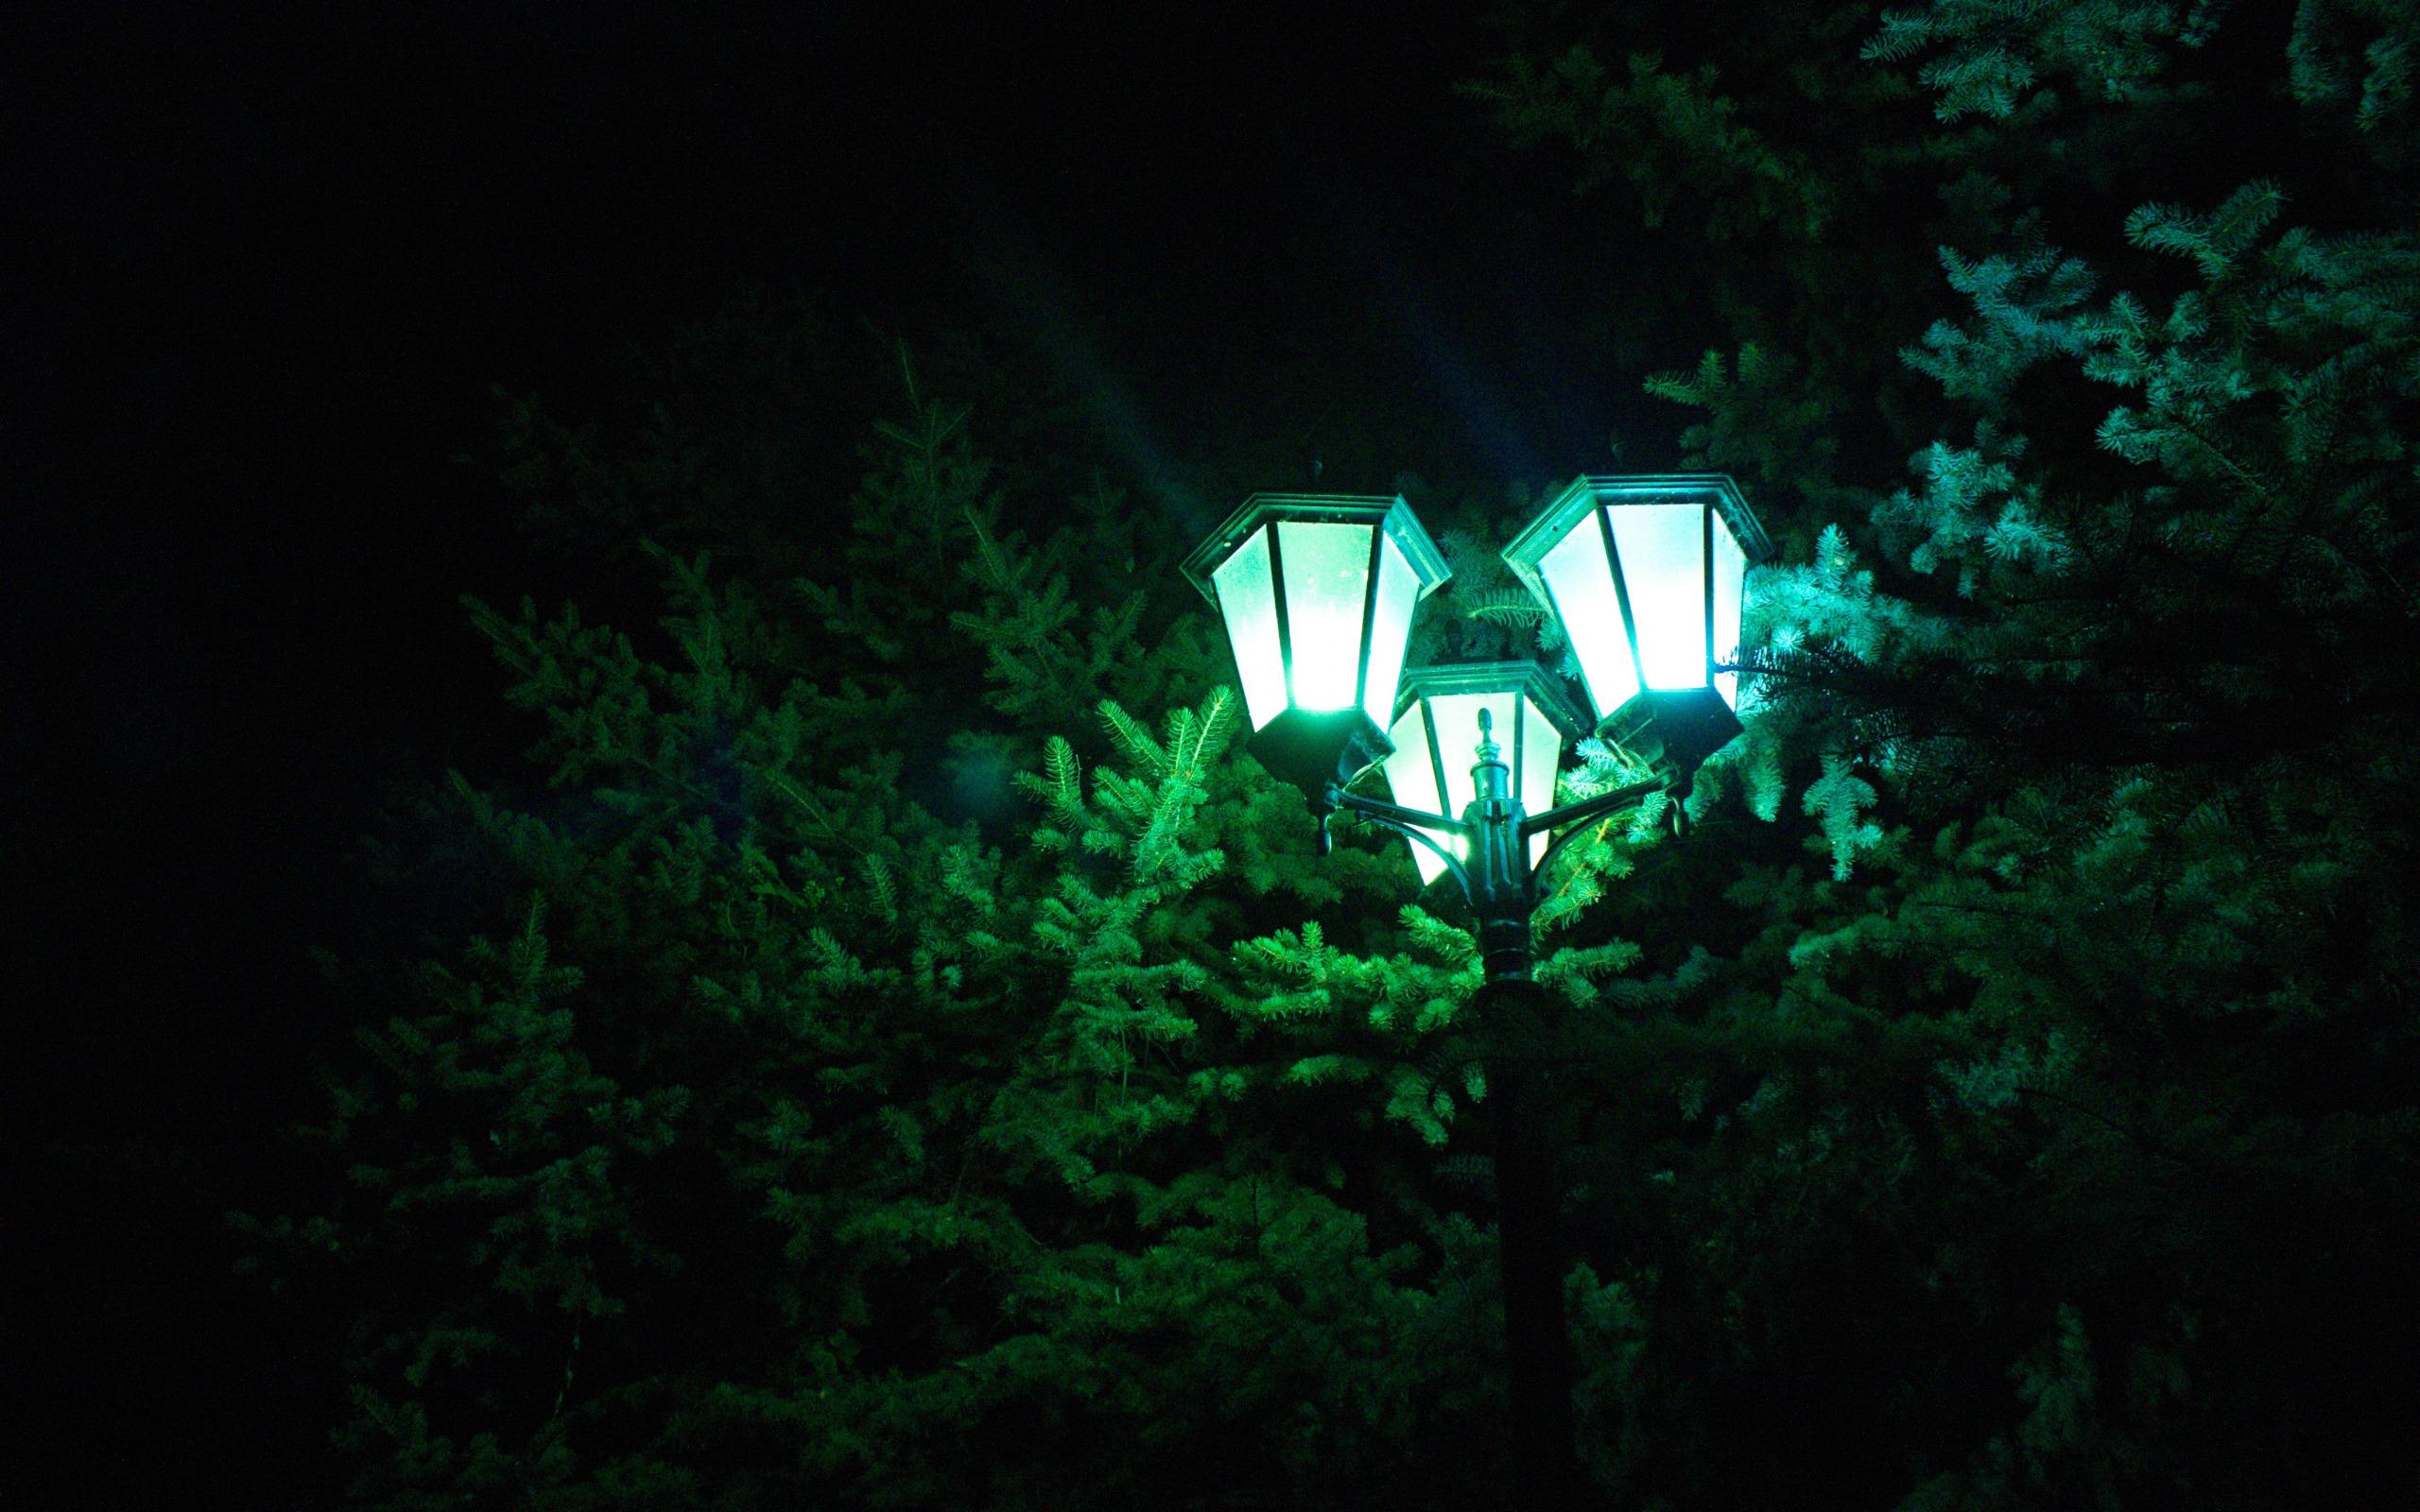 Картинки лесные фонари